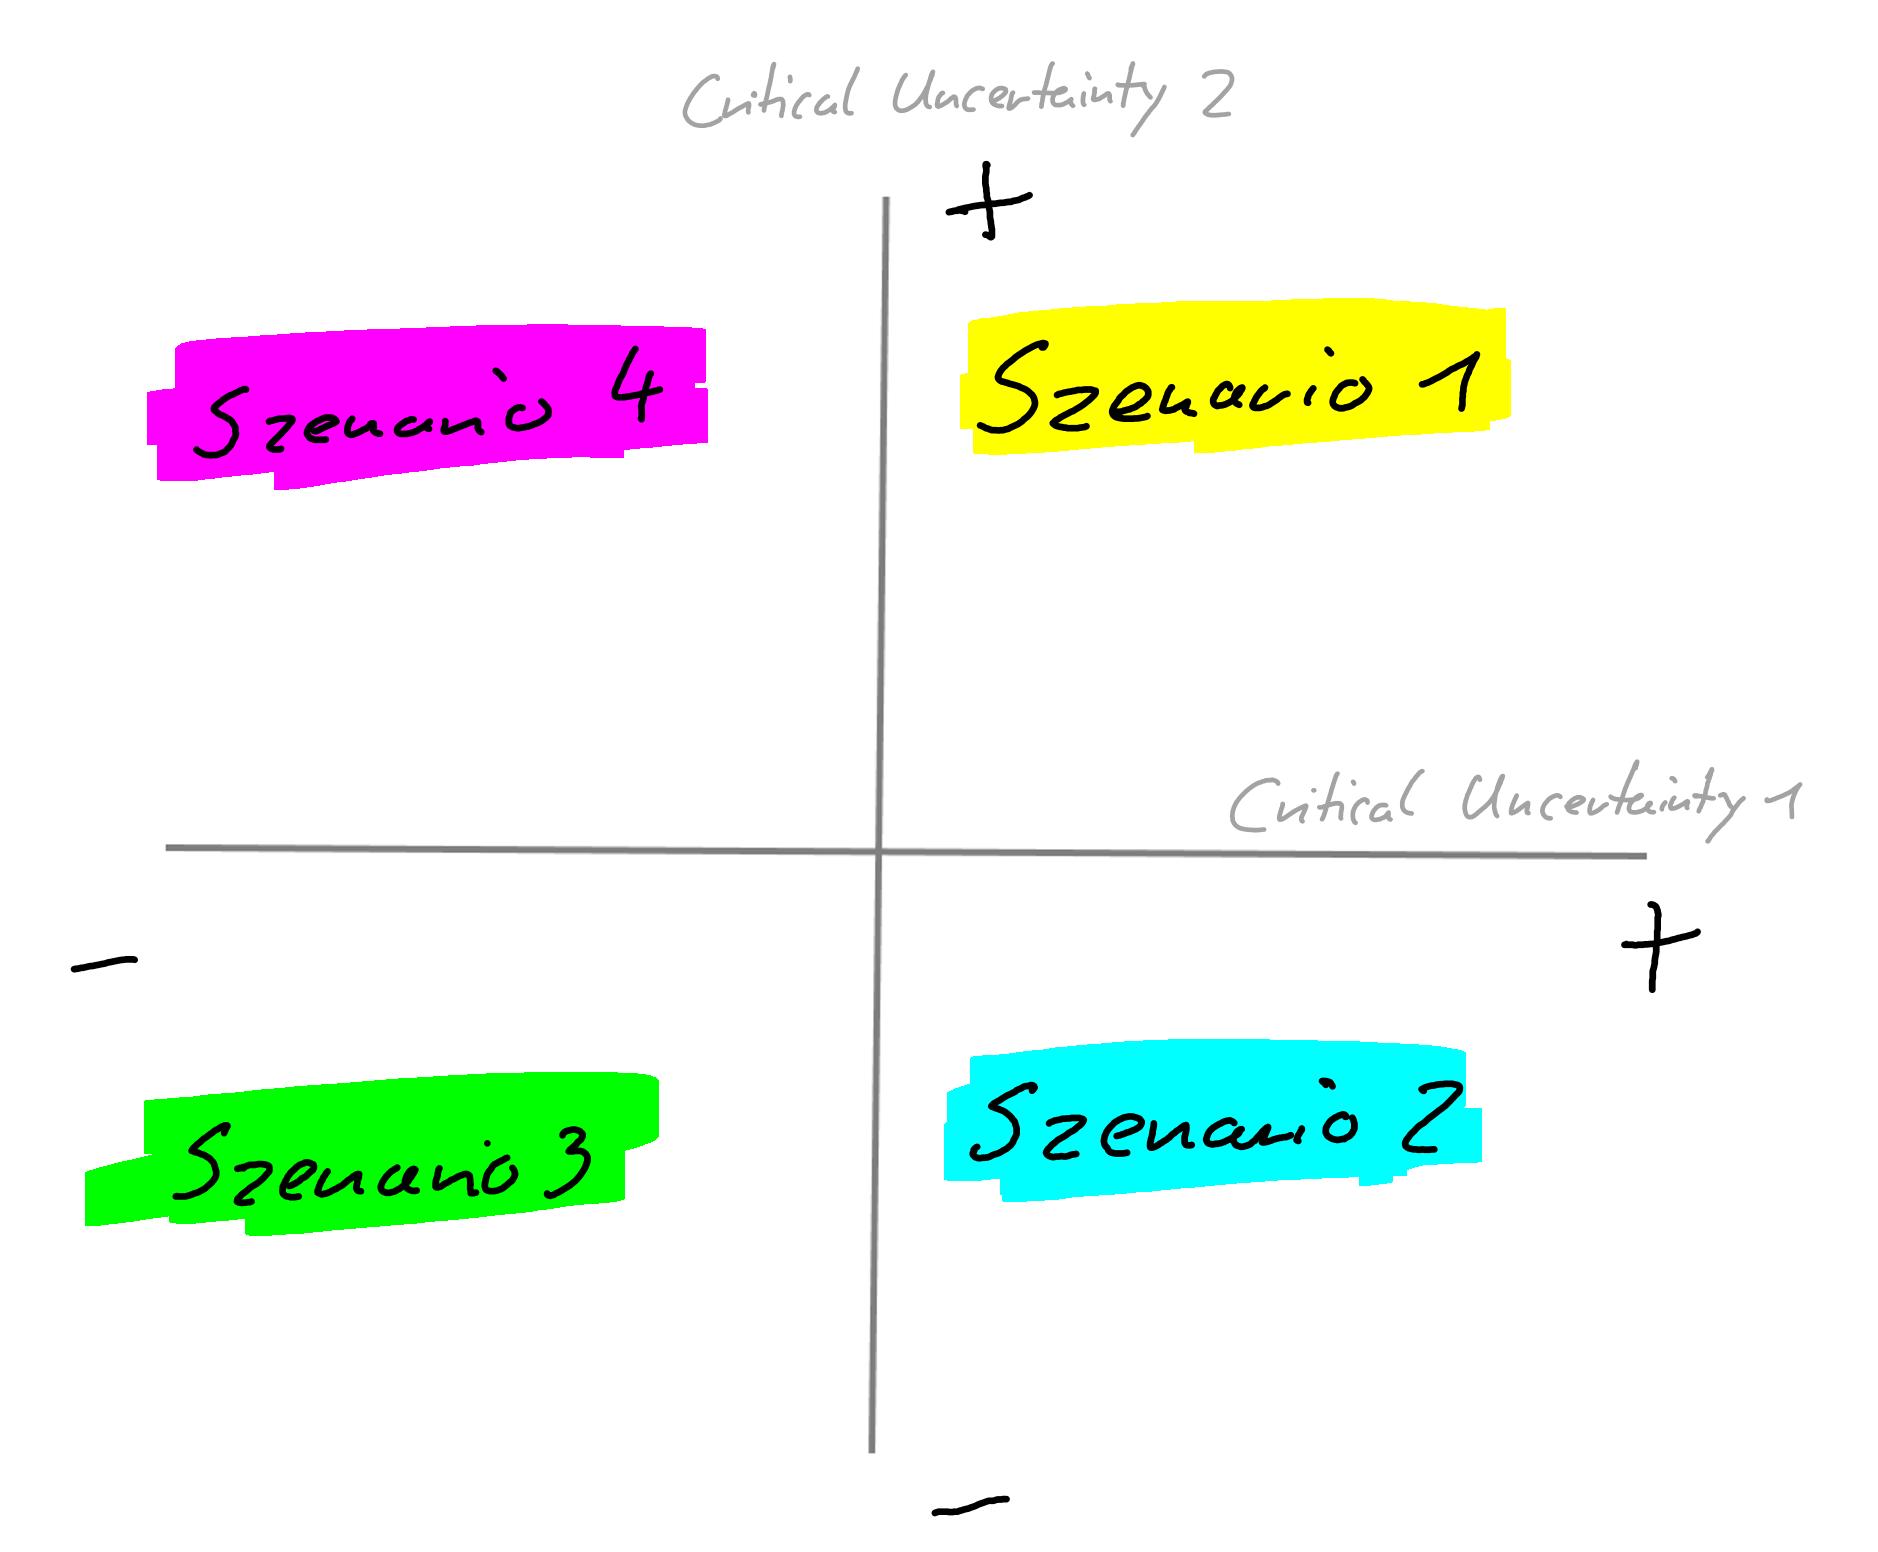 Abbildung 2: Impact/Predictability chart (eigene Darstellung)